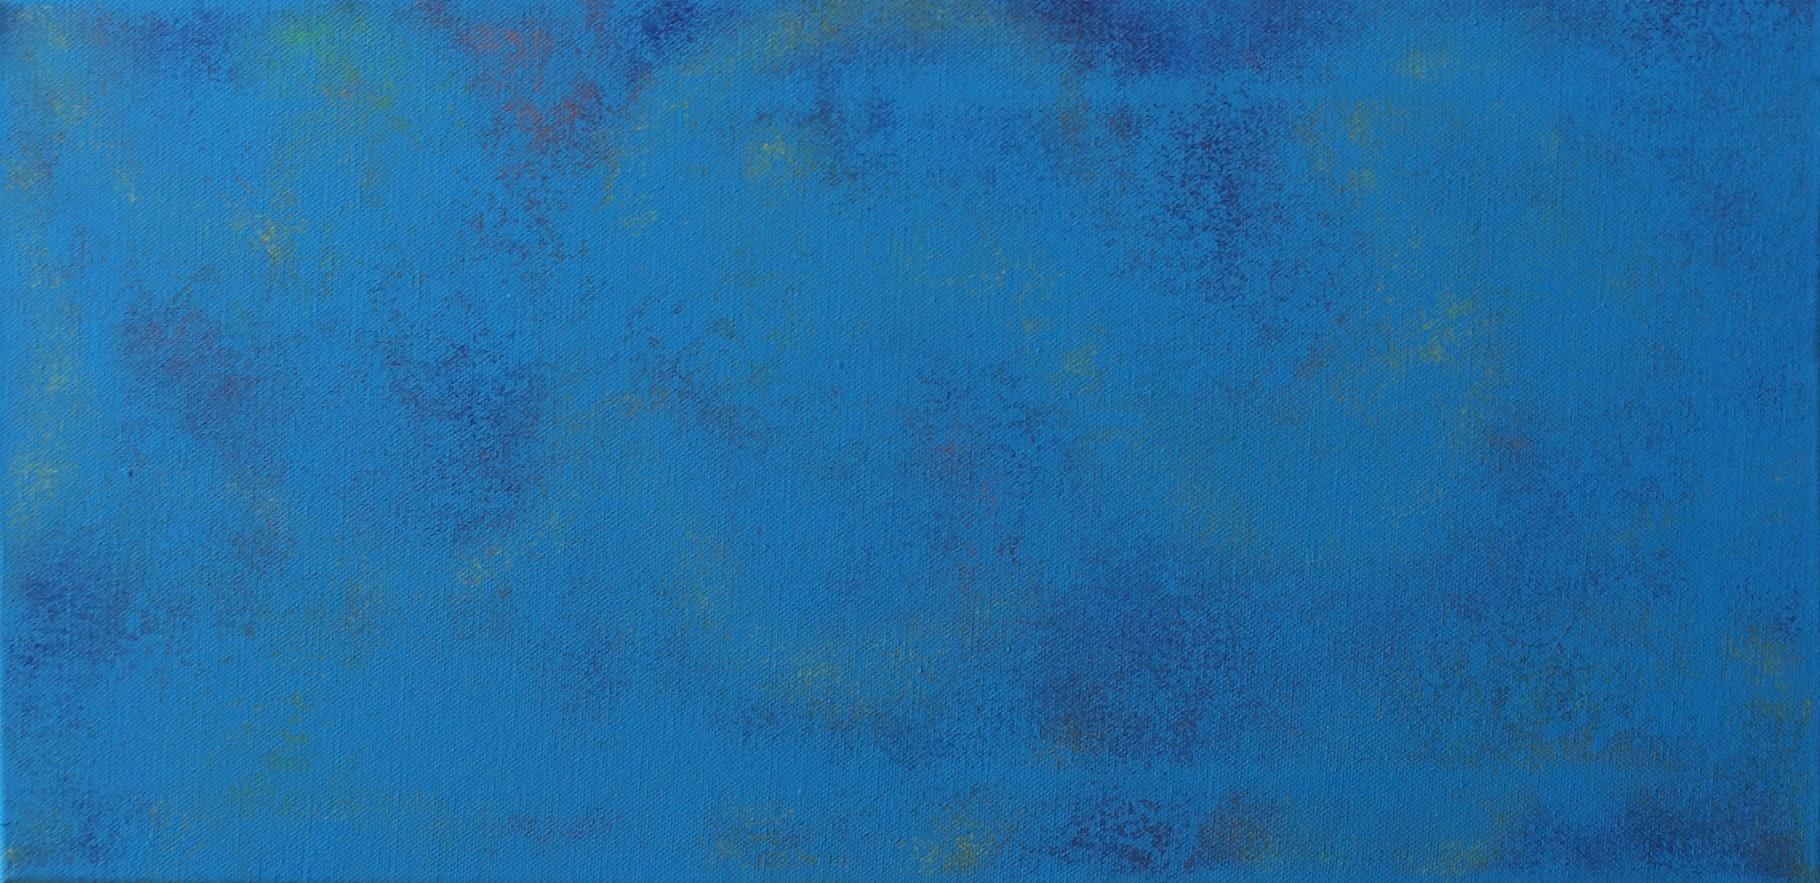 Träumerei - 30 x 60  - Acryl auf Leinwand - Fr. 100.-